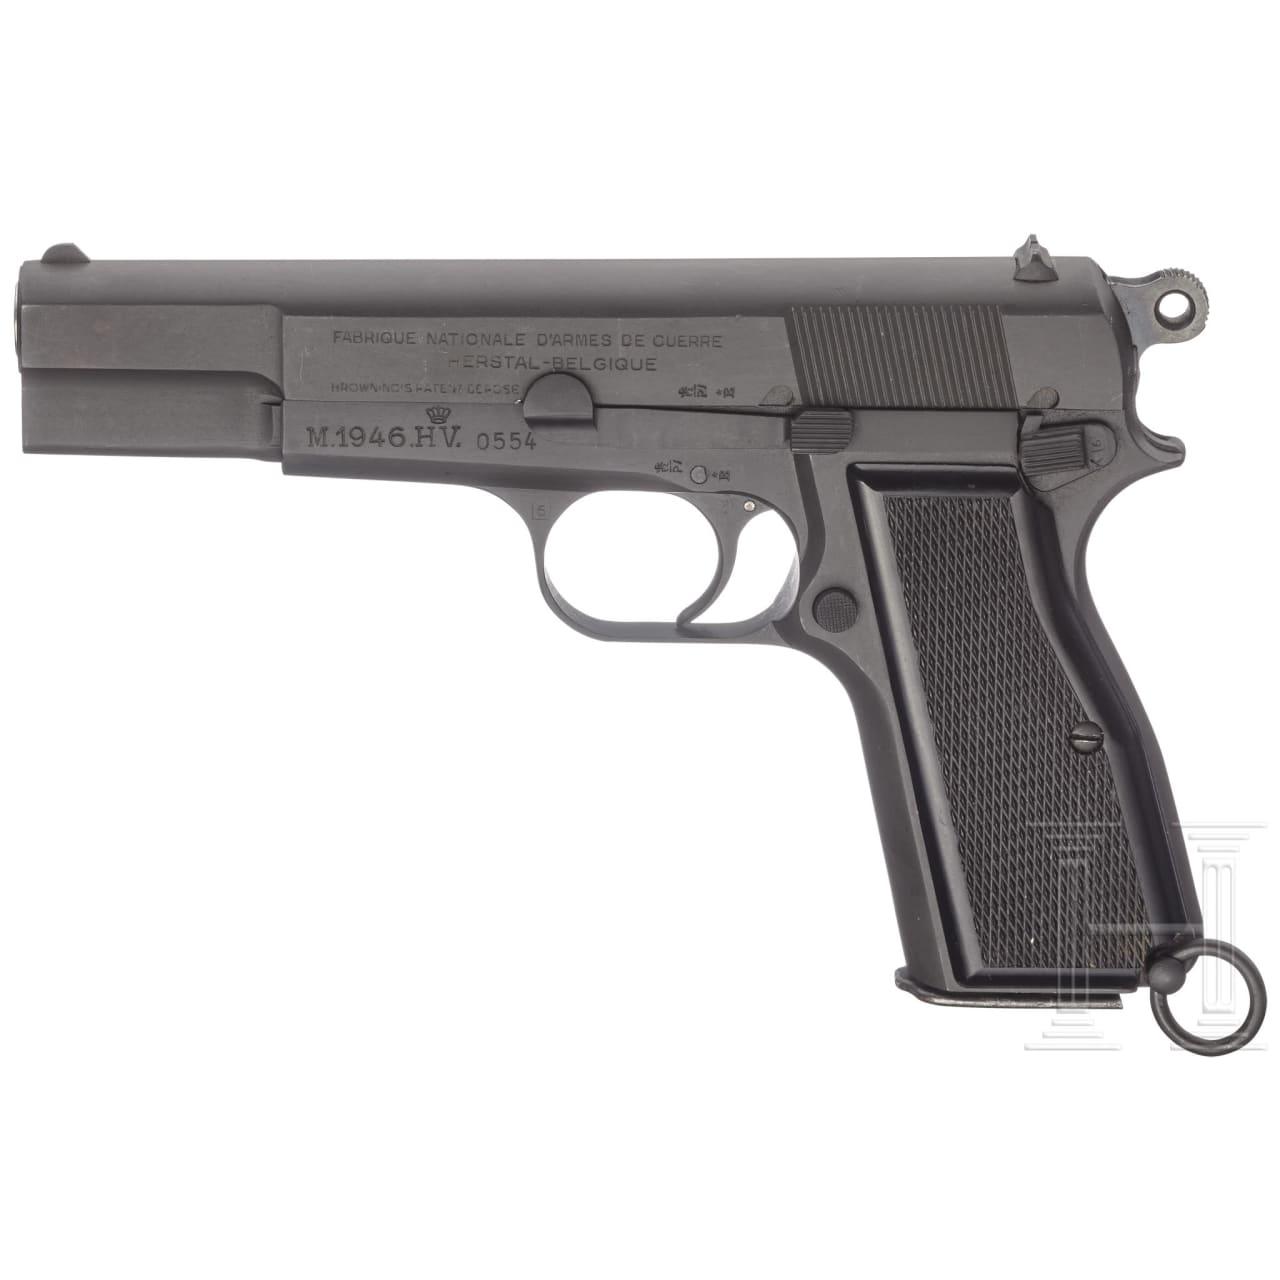 FN HP Mod. 35 (m/46 DK)